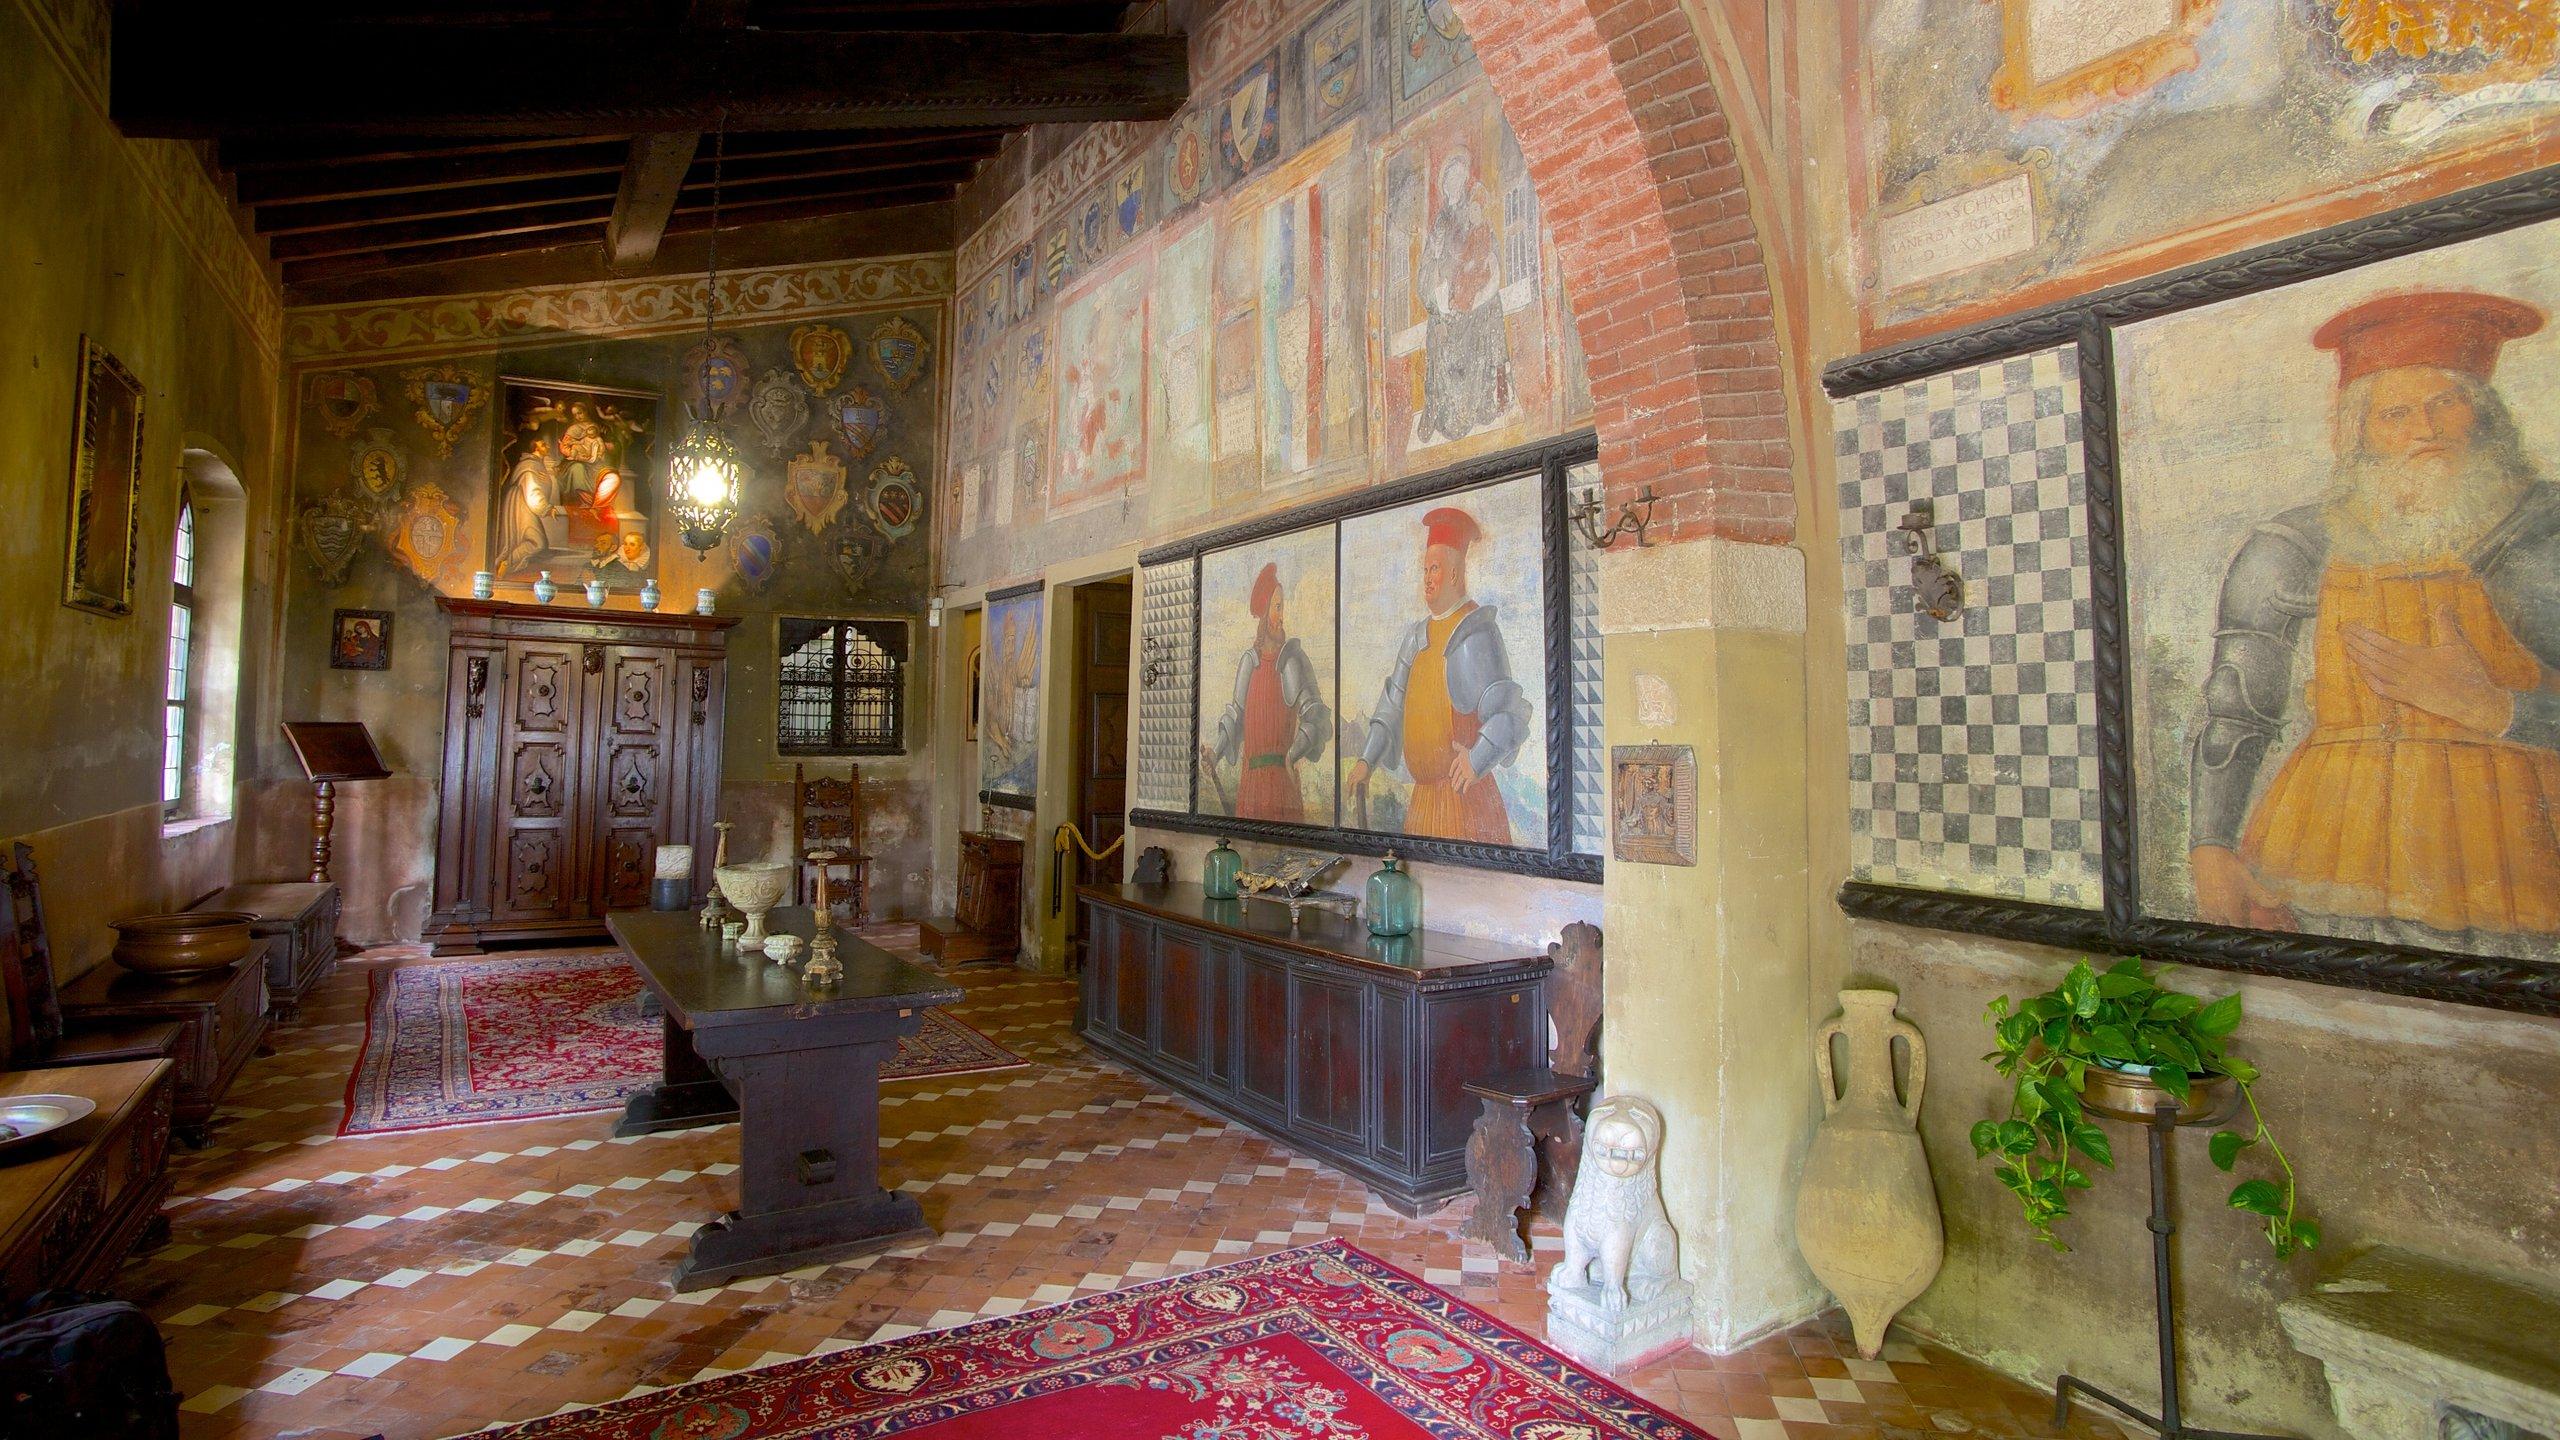 House of the Podesta, Lonato del Garda, Lombardy, Italy